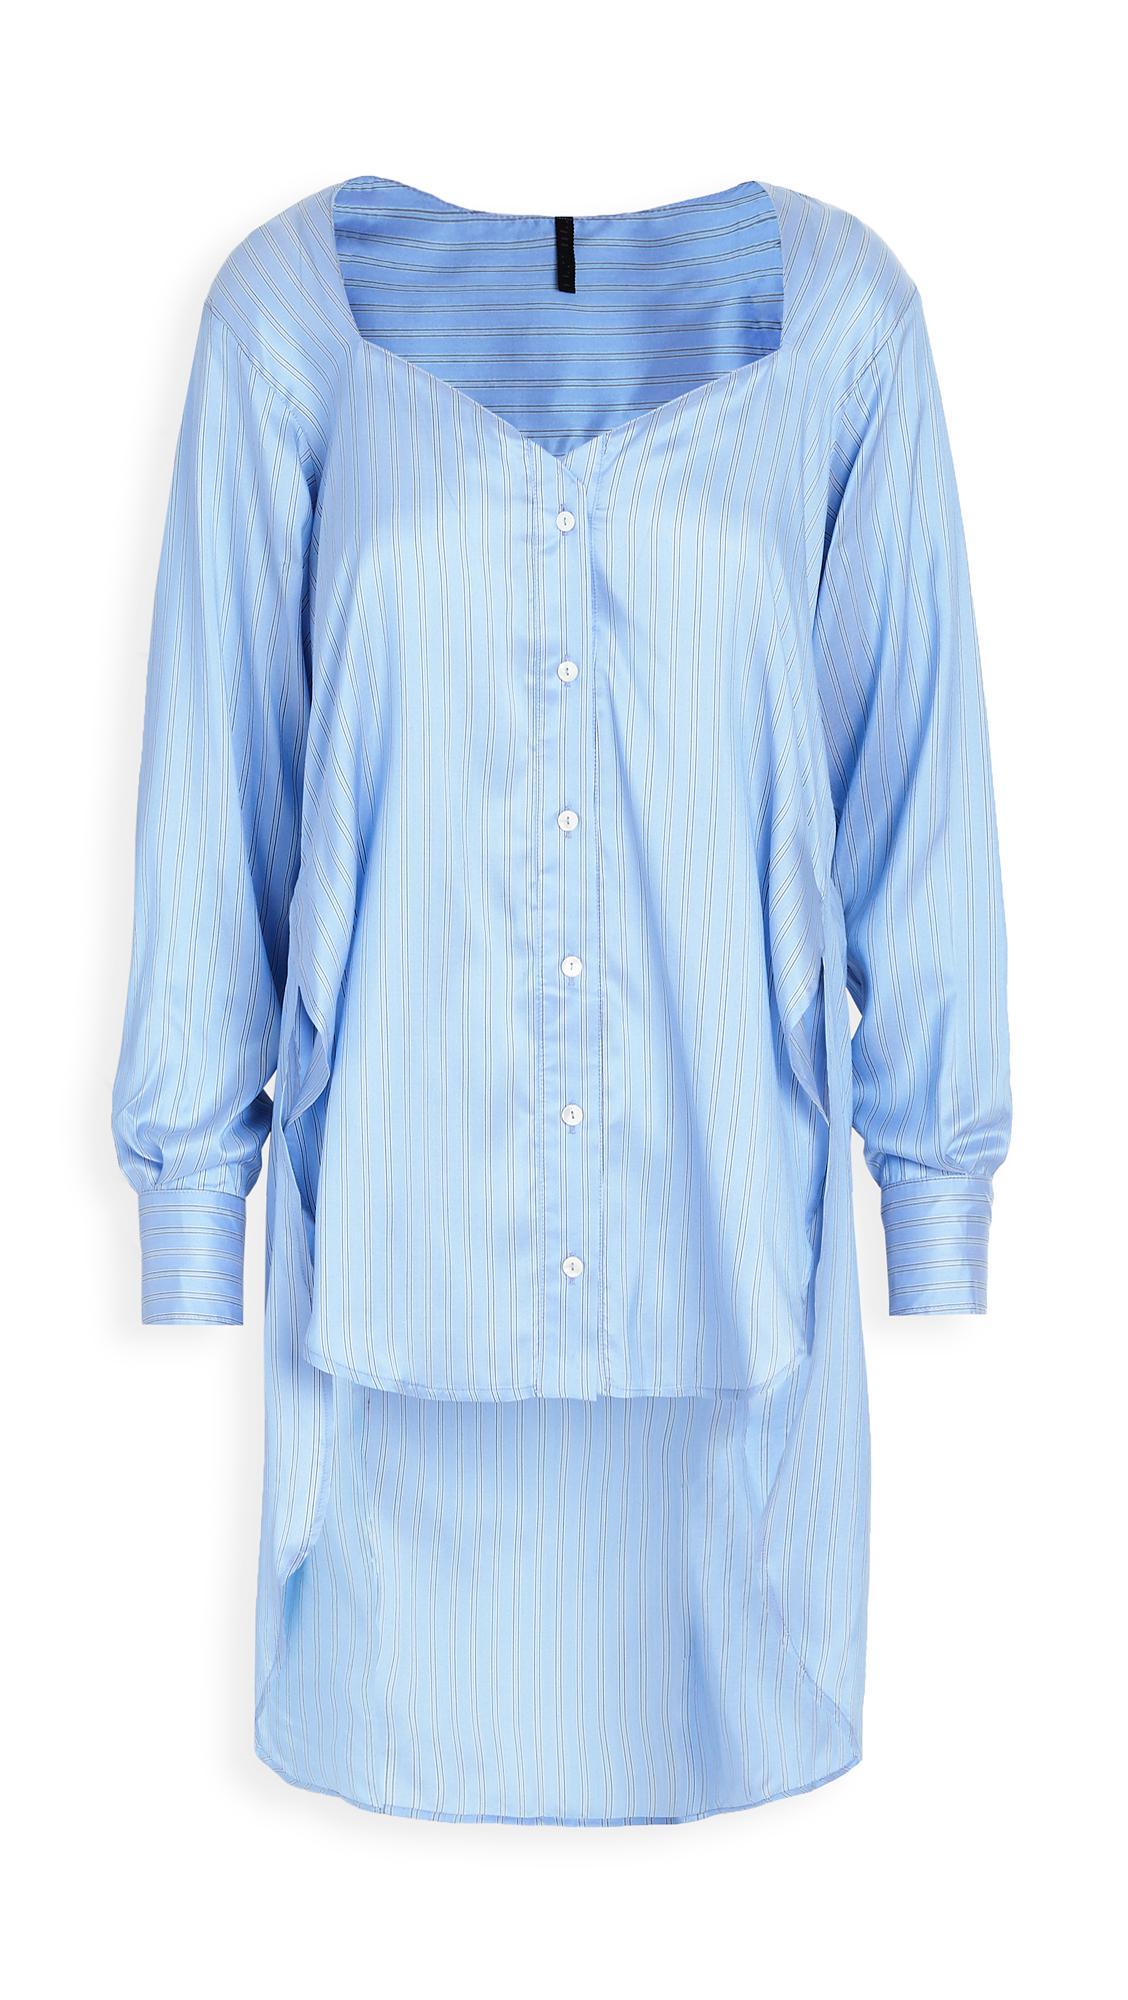 Unravel Project Heart Shaped Neckline Shirt - 50% Off Sale